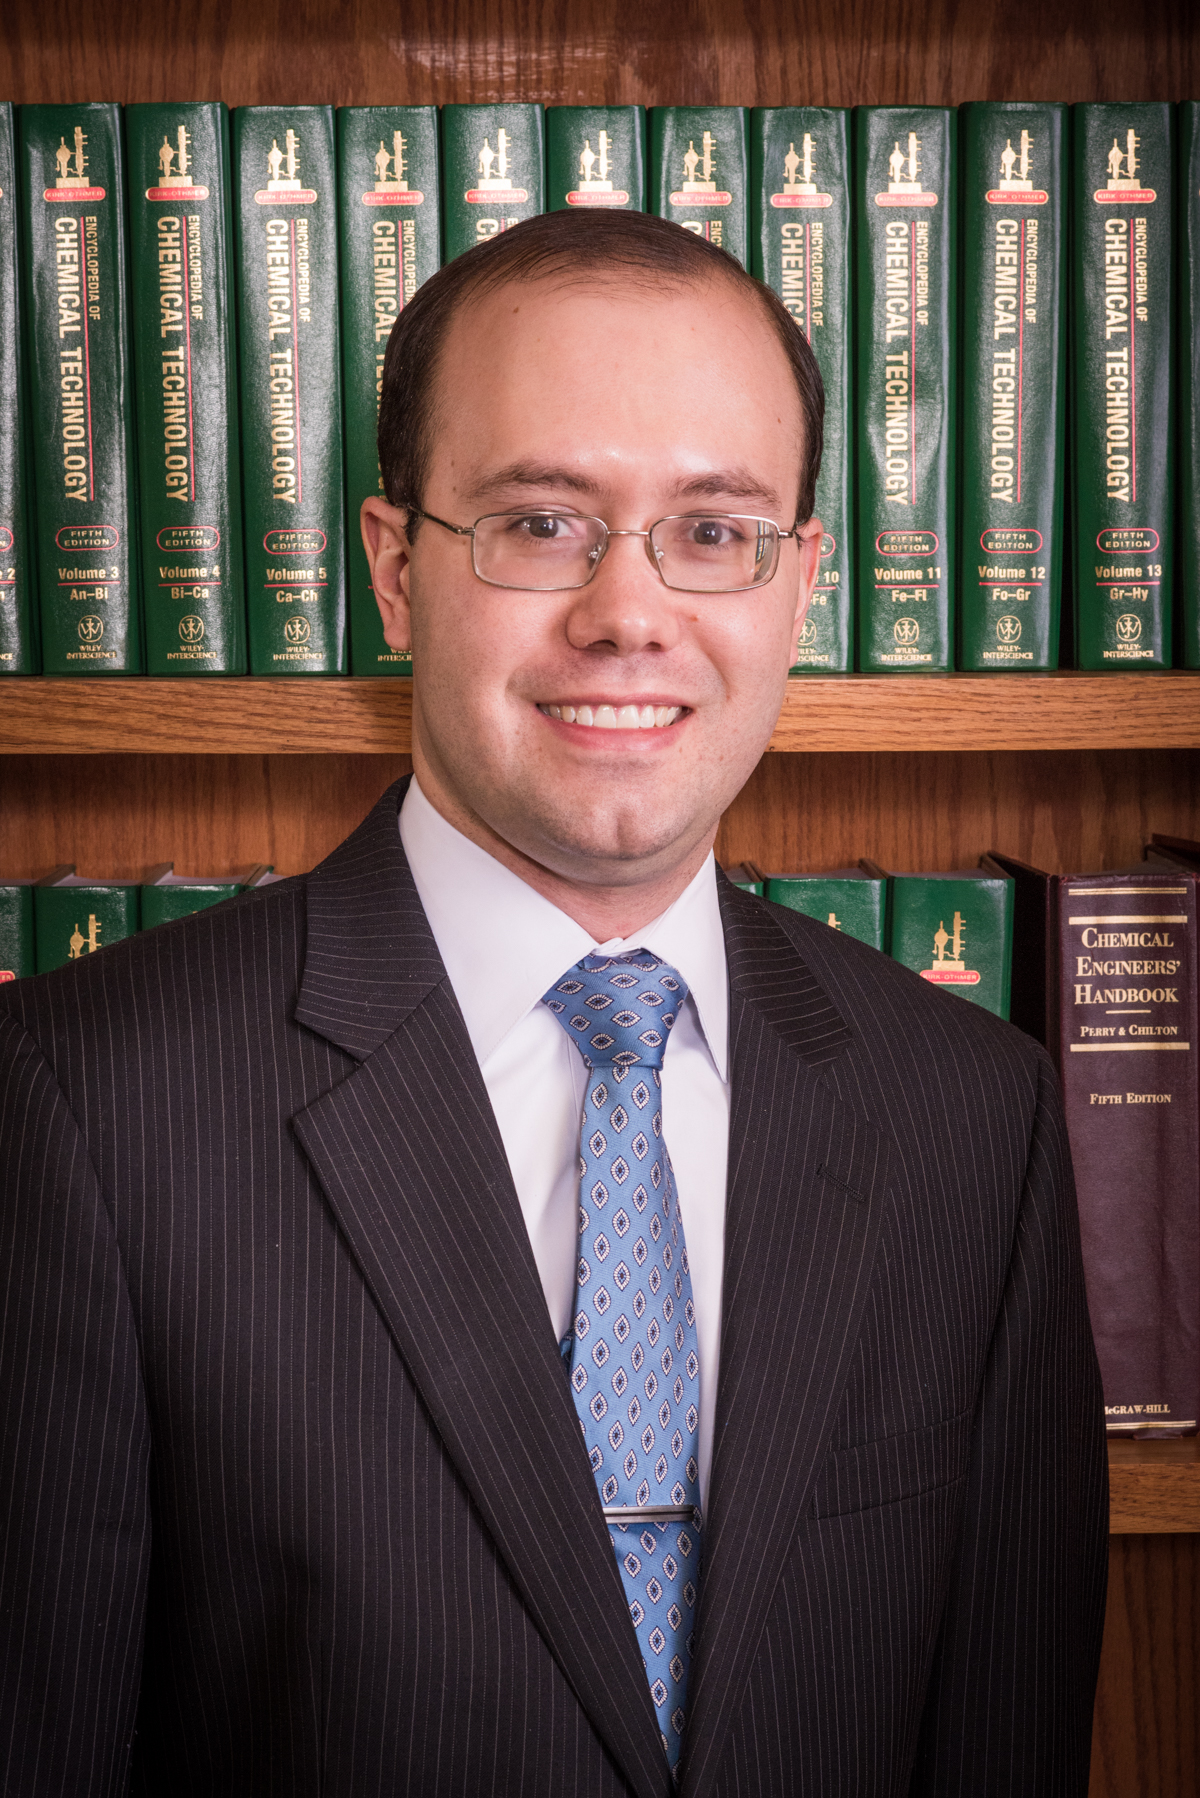 Jeffrey Banyas